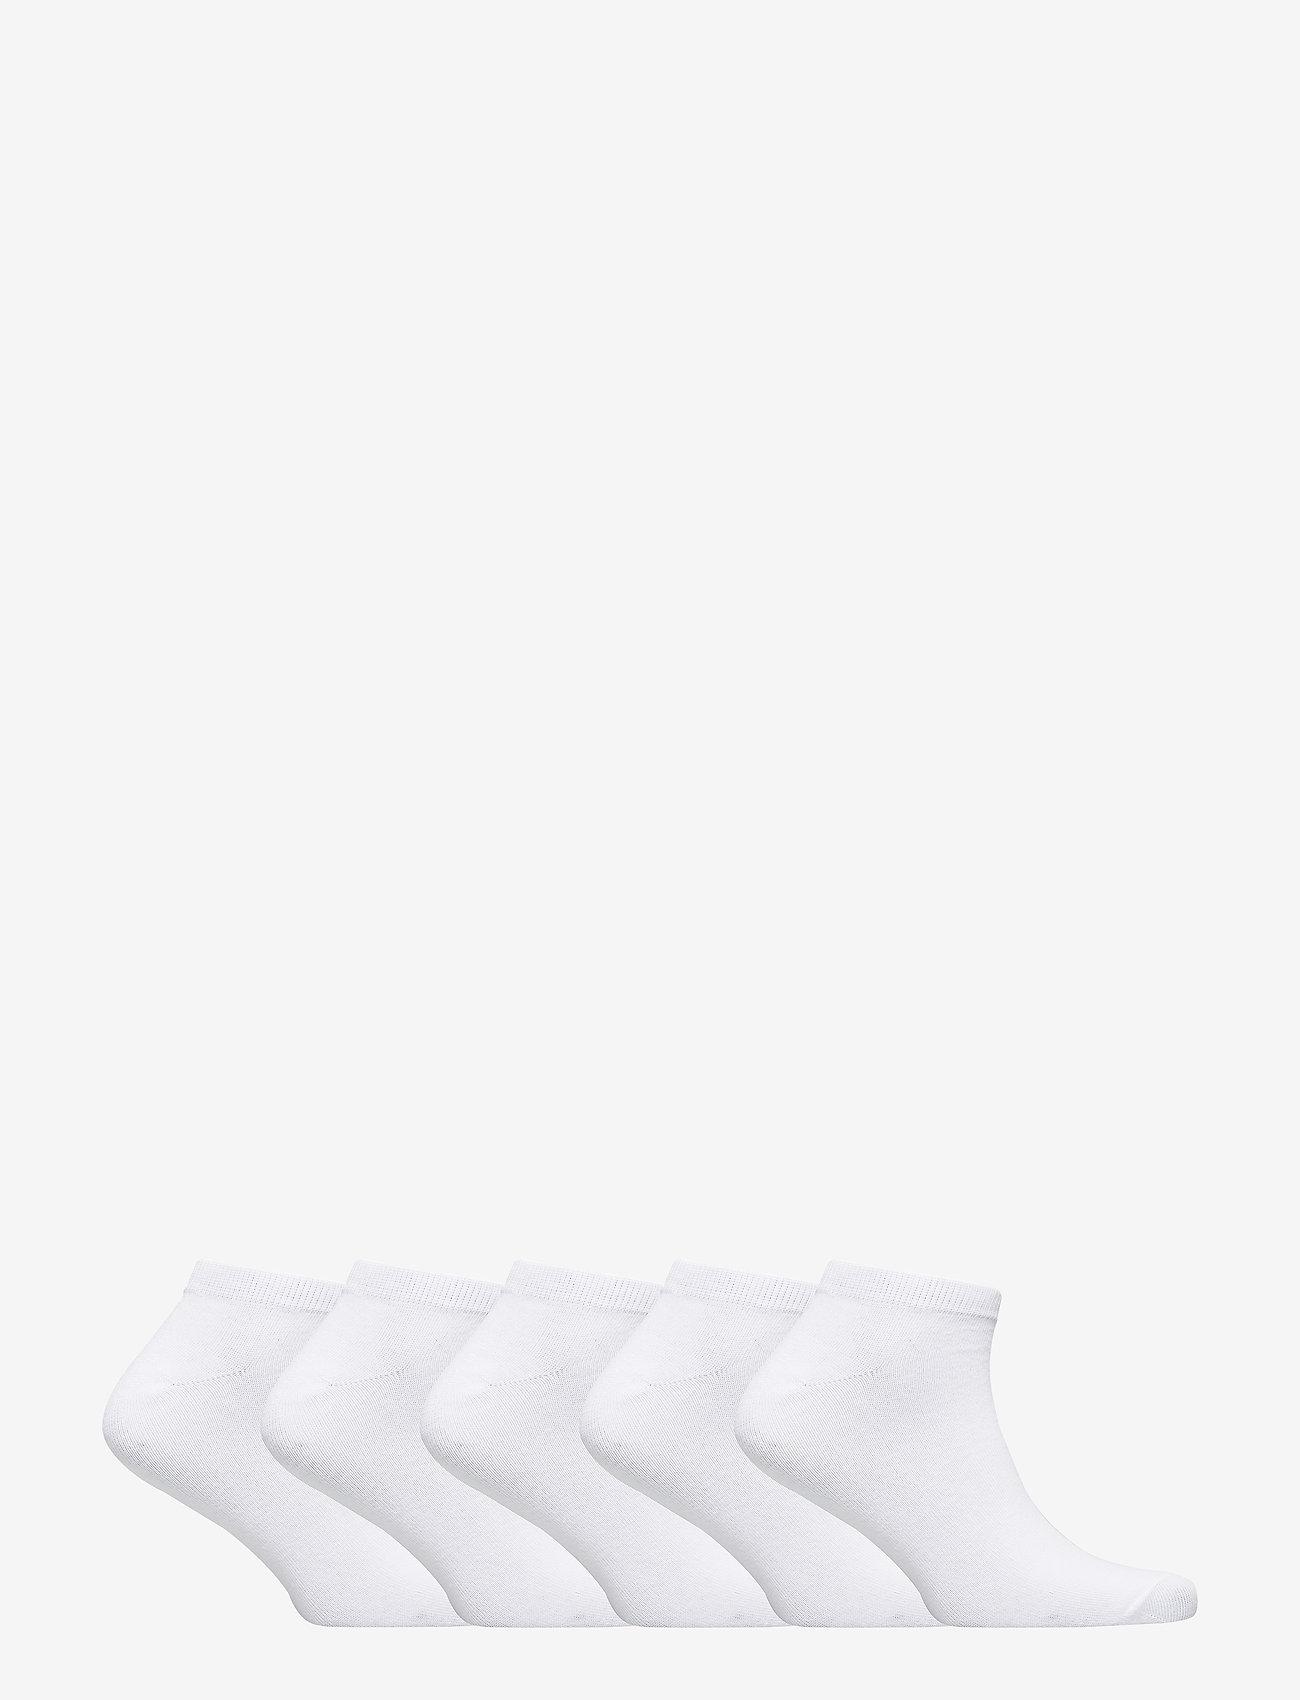 Jack & Jones - JACDONGO SOCKS 5 PACK NOOS - skarpety za kostkę - white - 1